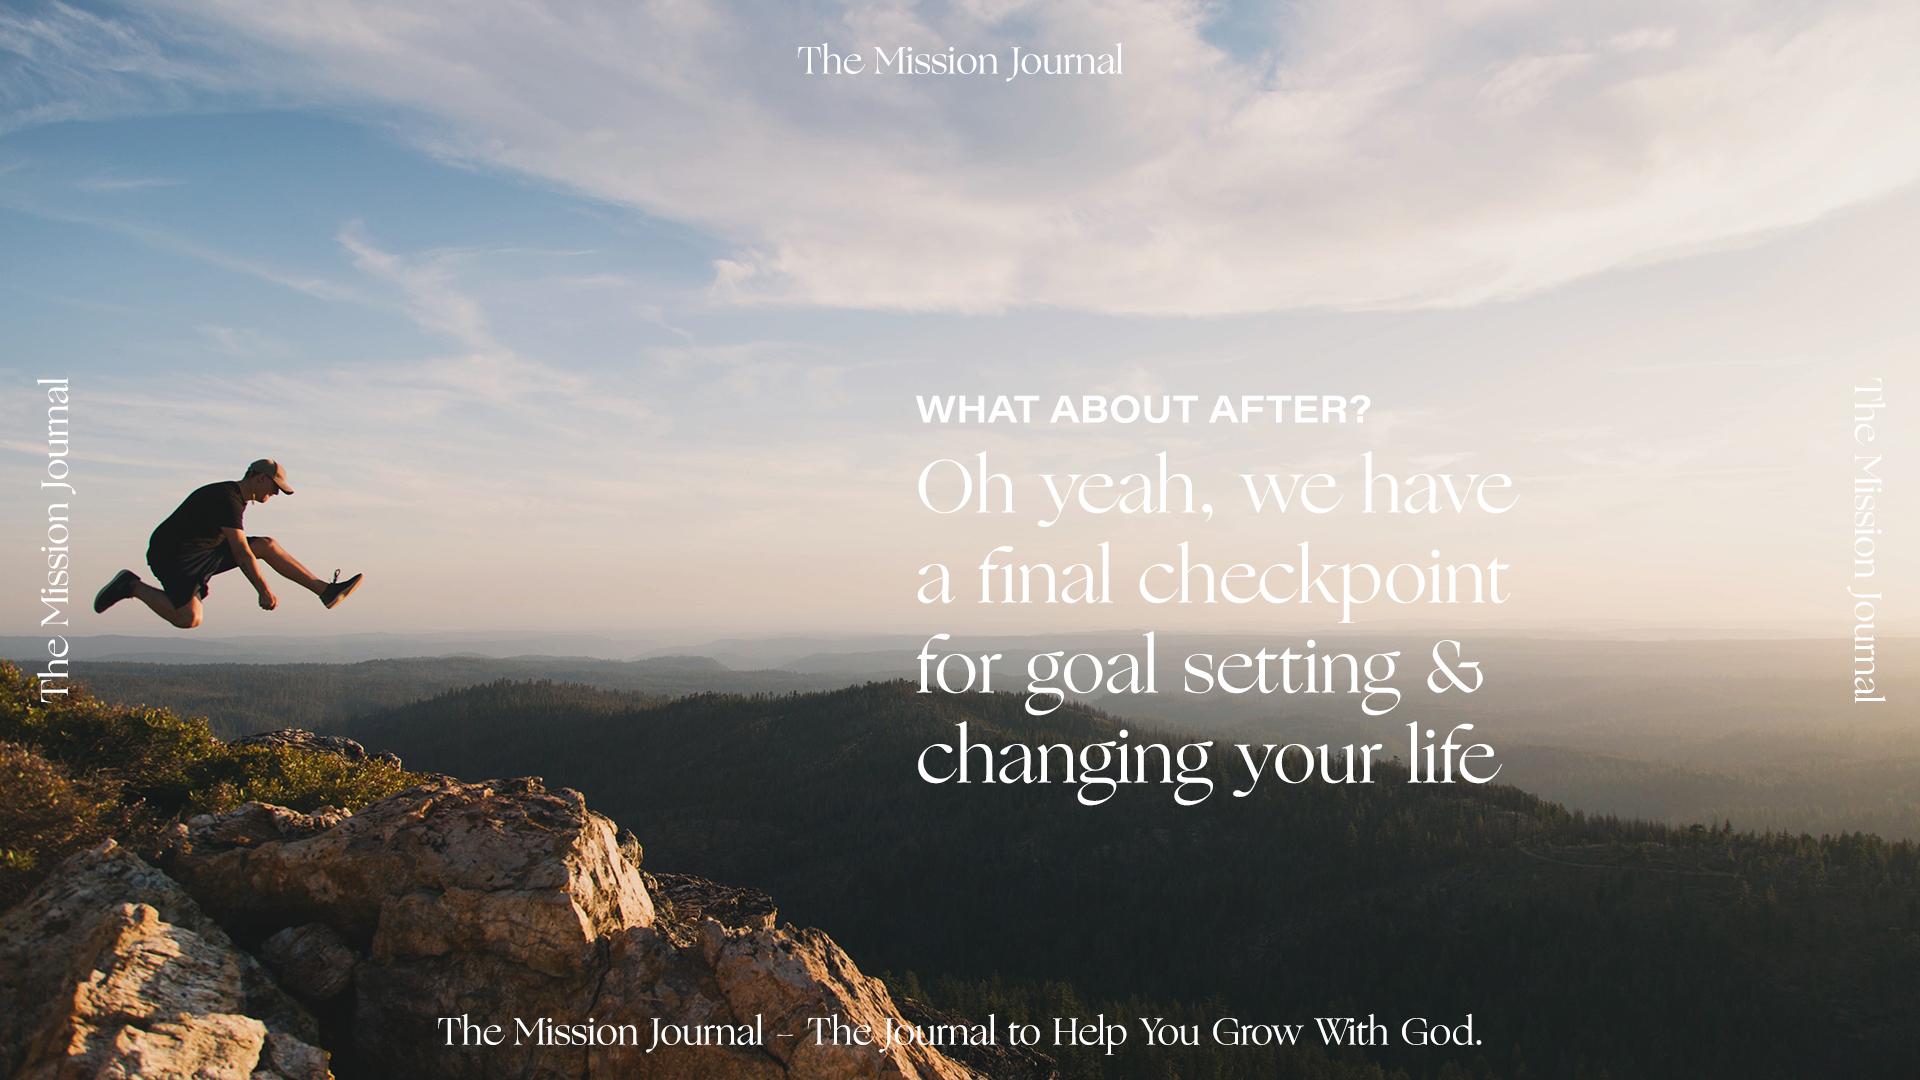 Mission Trip JournalSet Goals After Your Missionary Trip.jpg